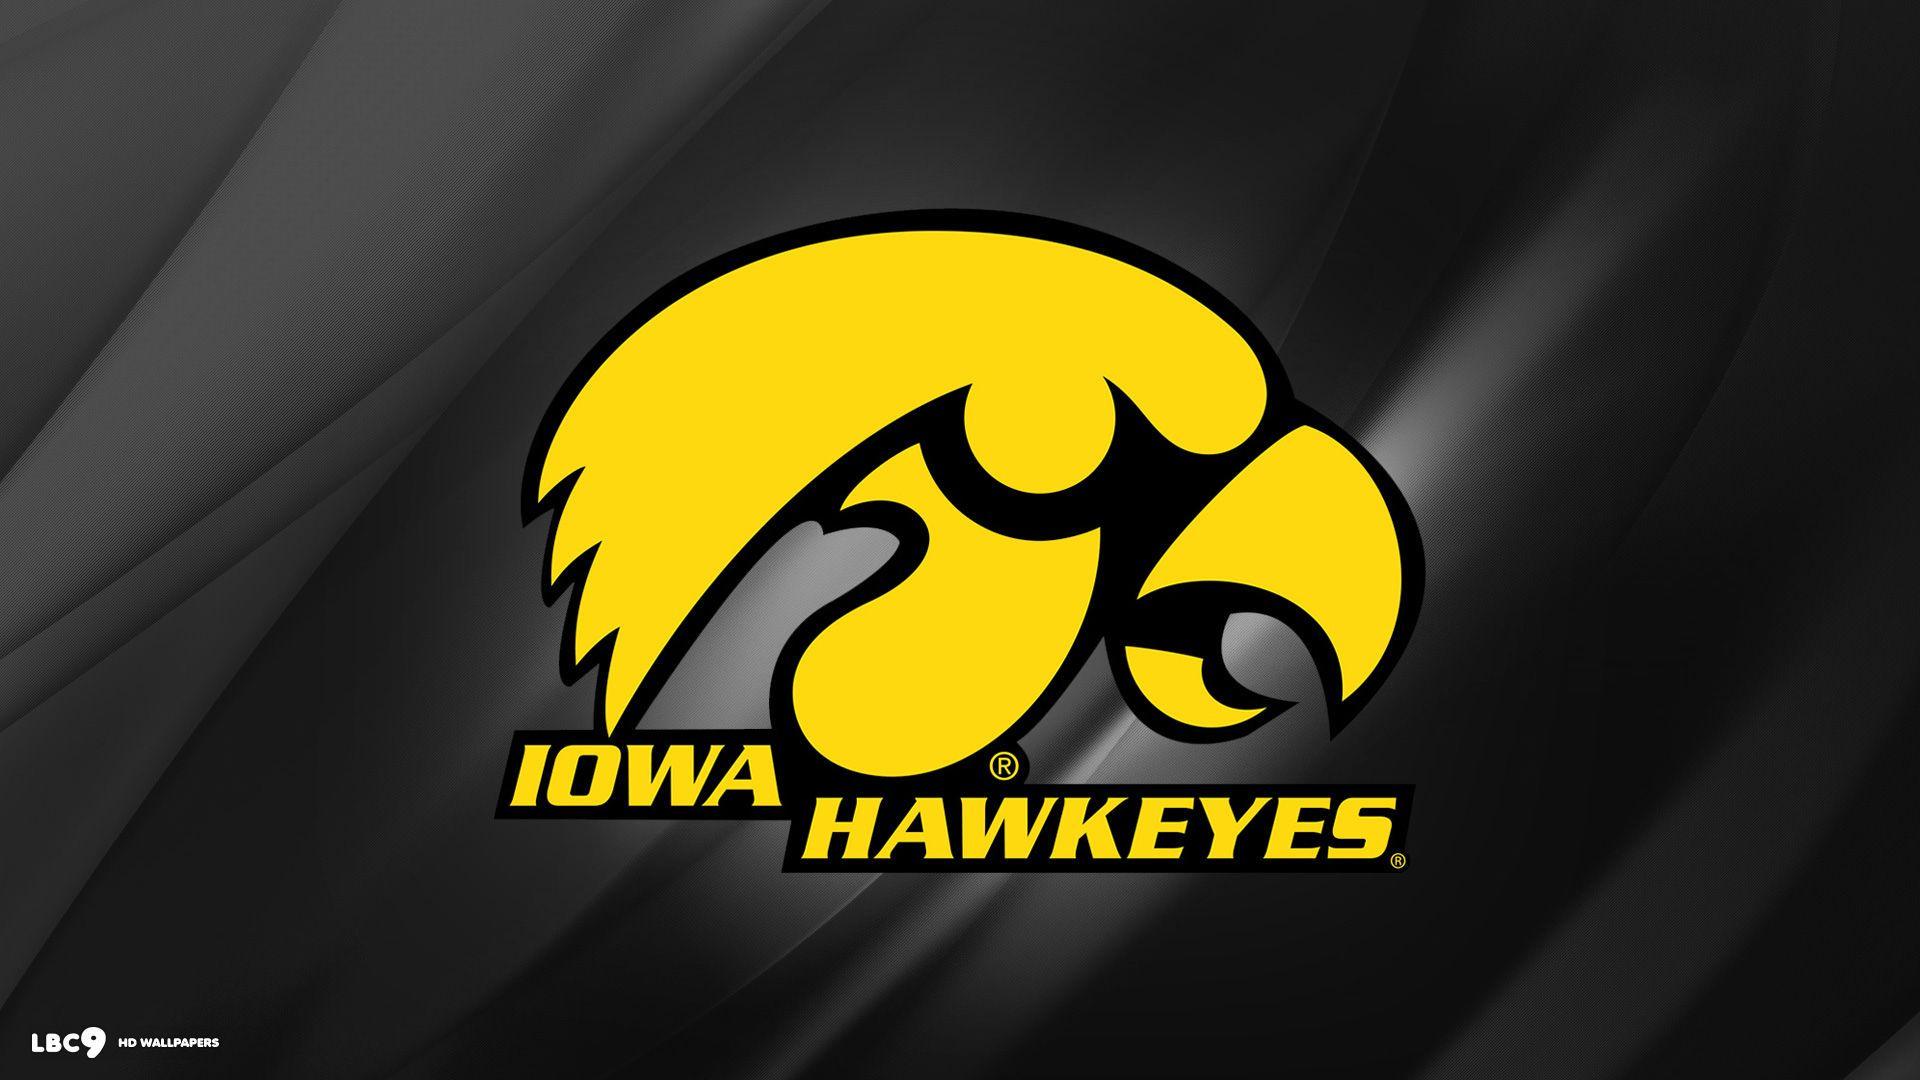 Iowa Hawkeyes Logo Iowa Hawkeyes 1920x1080 Iowa Hawkeye Football Iowa Hawkeyes Hawkeye Football